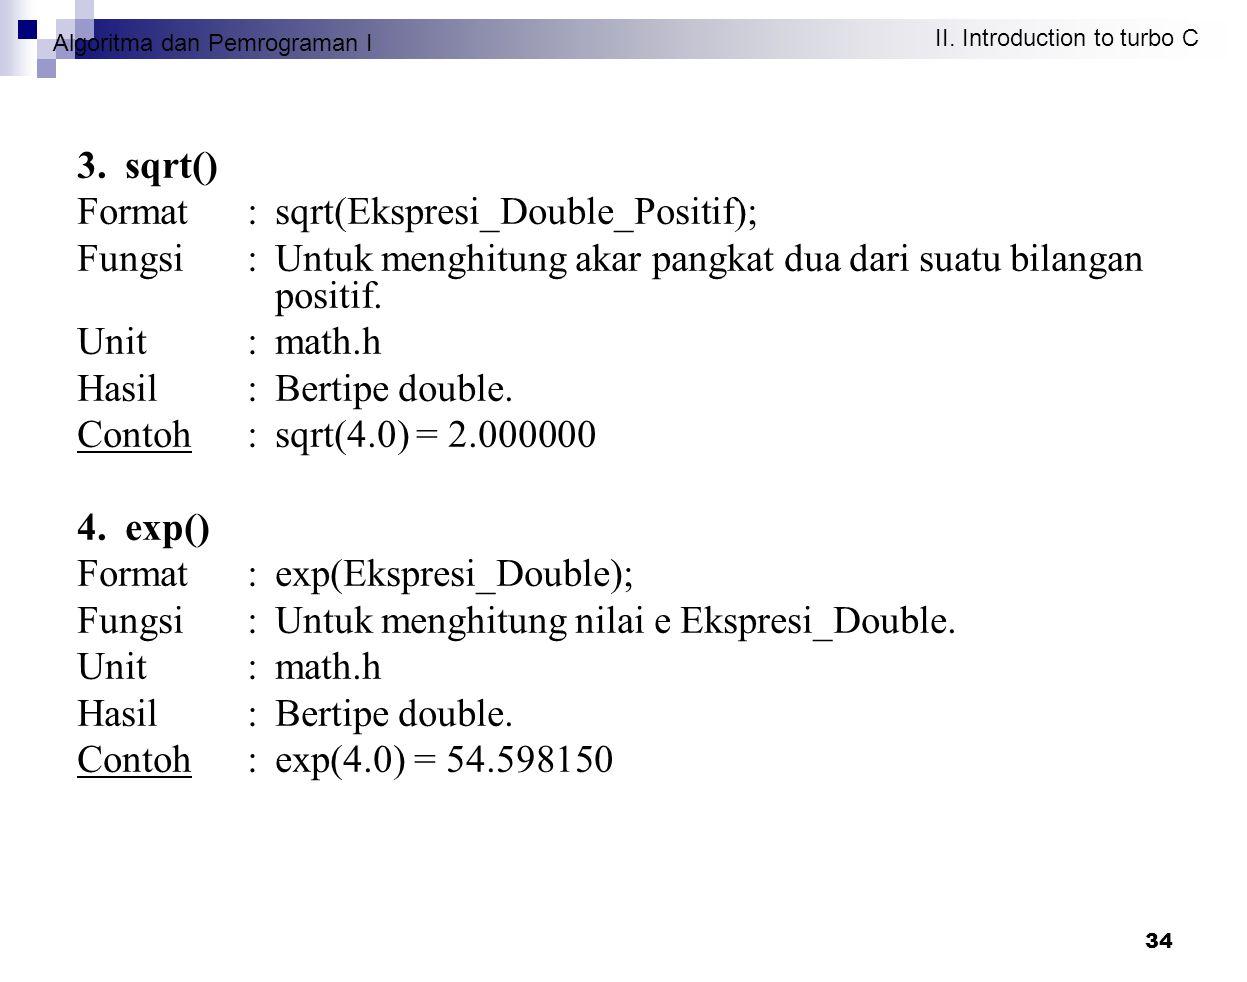 Algoritma dan Pemrograman I II. Introduction to turbo C 34 3. sqrt() Format : sqrt(Ekspresi_Double_Positif); Fungsi : Untuk menghitung akar pangkat du